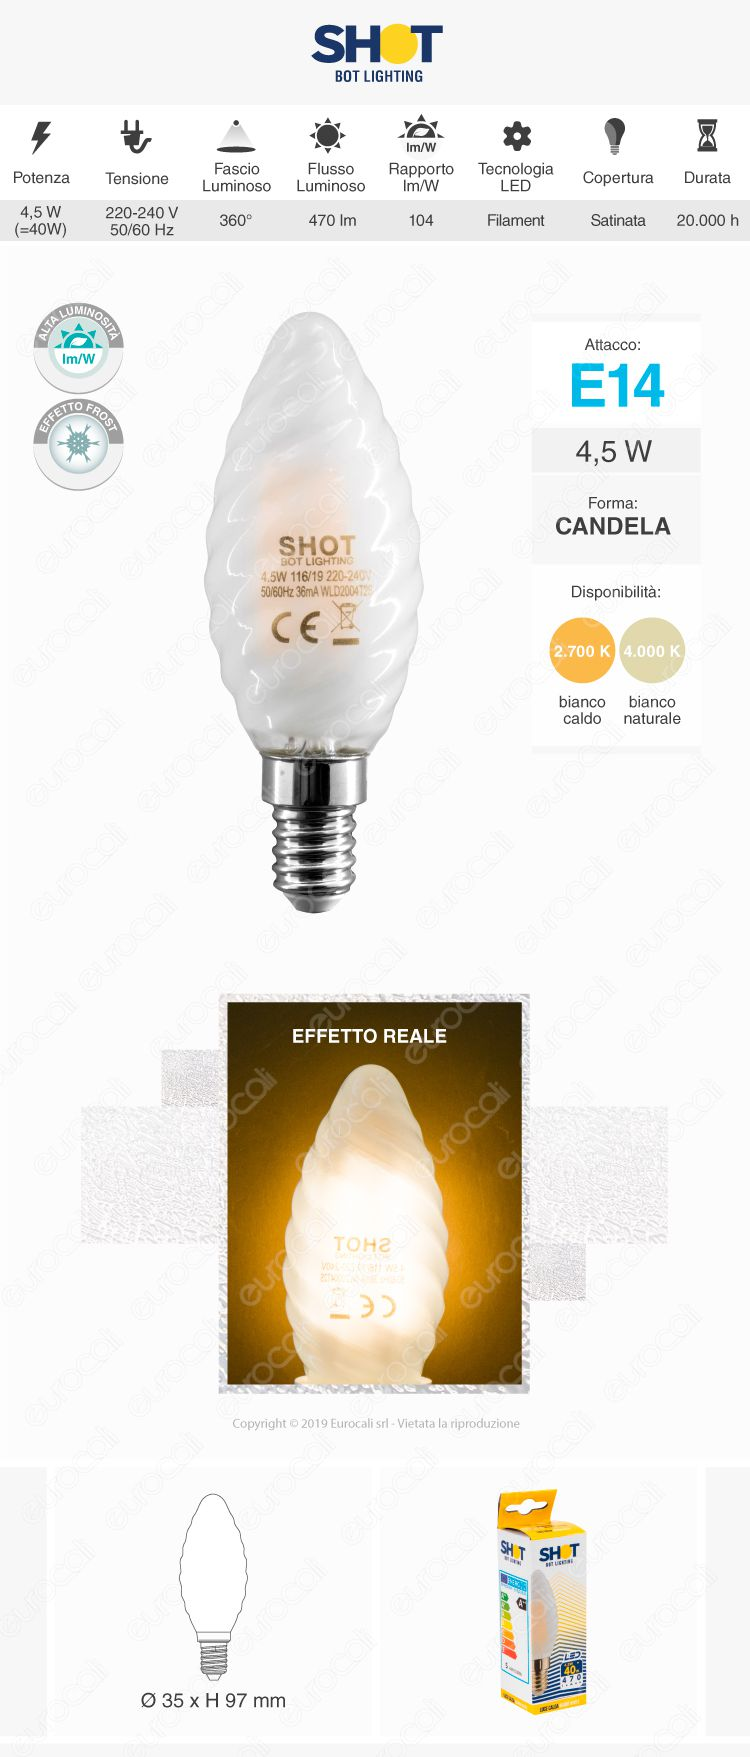 Bot Lighting Shot Lampadina LED E14 Filament Candela Twist